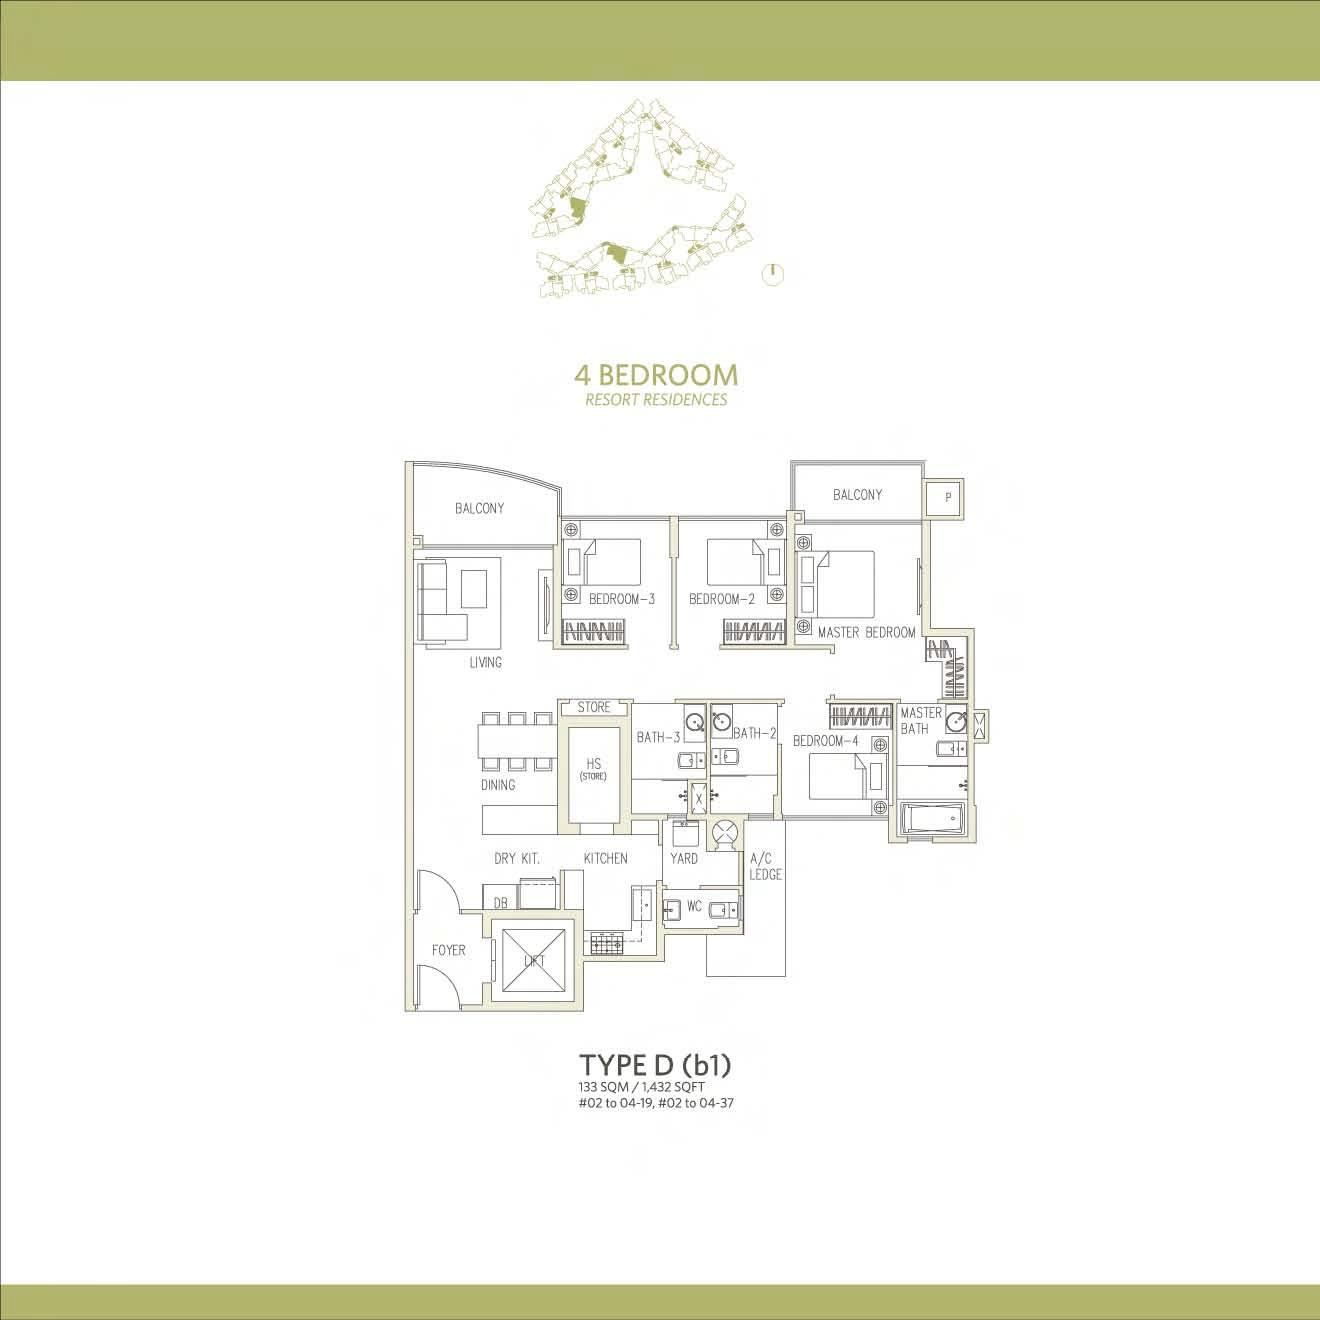 Canberra Residences 4 Bedroom Floor Plans Type D(b1)